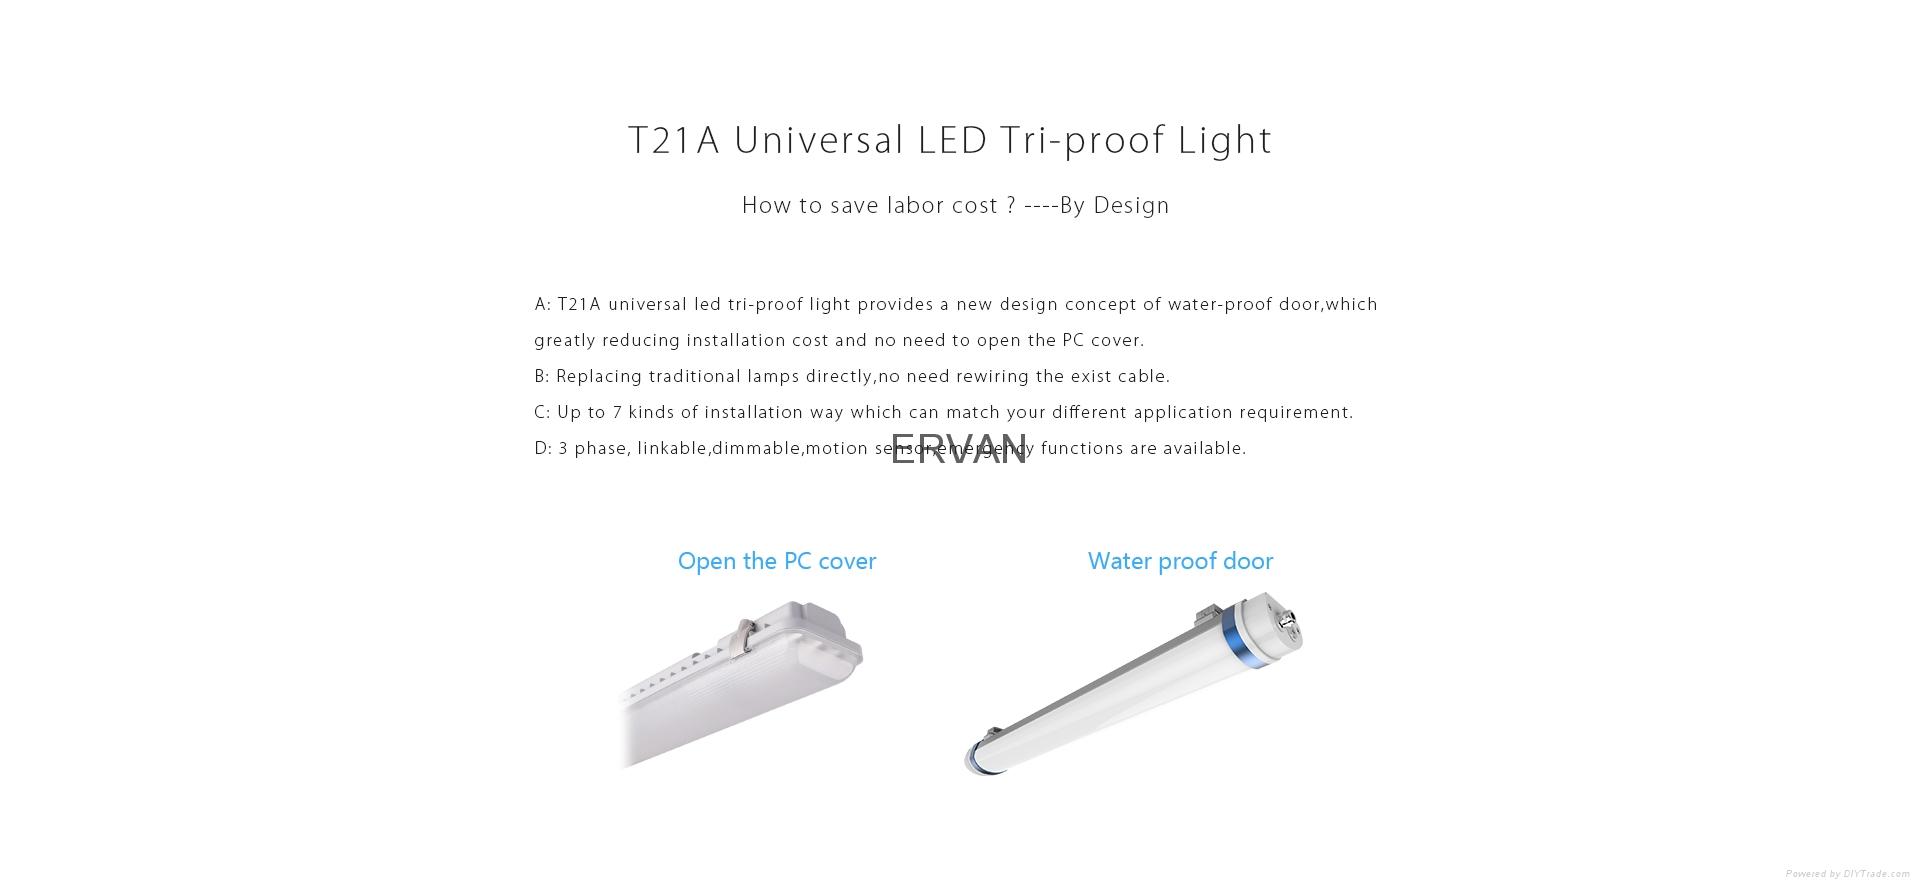 5ft wireless control motion sensor High power T21 Universal Weather proof light  9